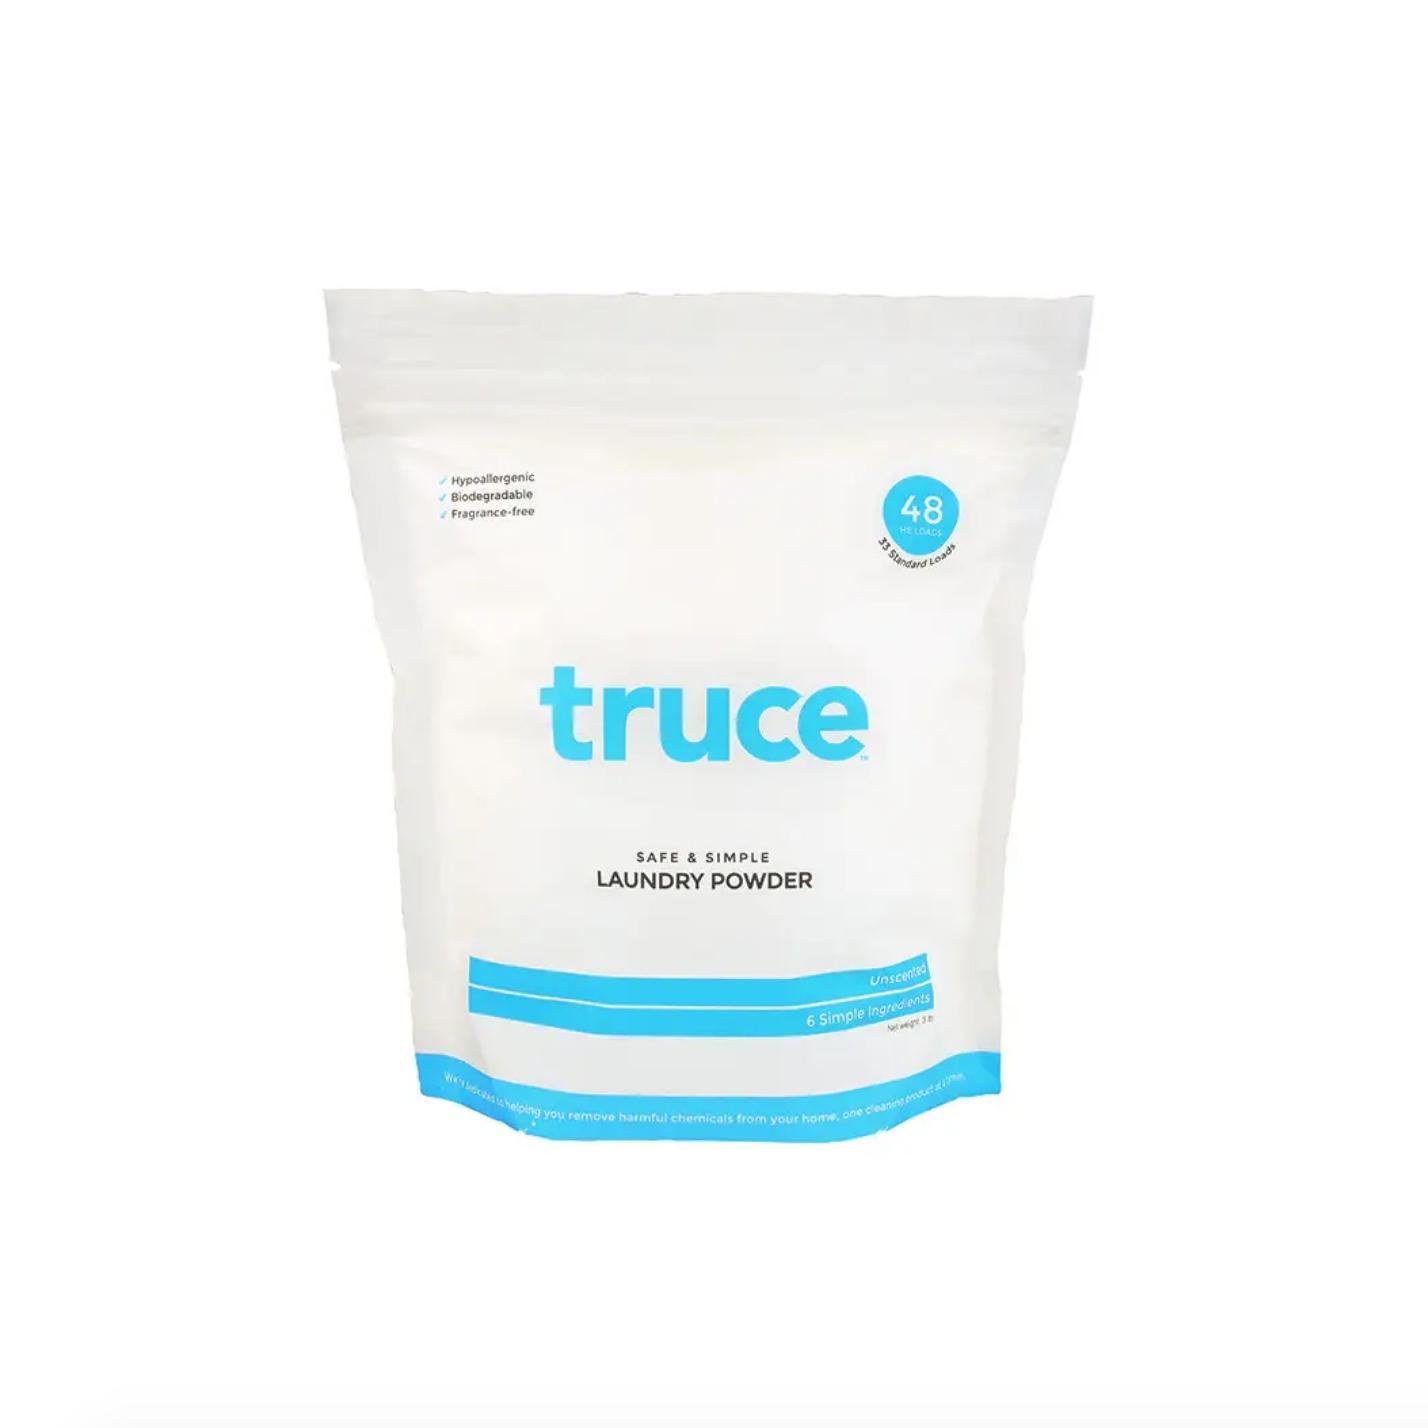 Truce Laundry Detergent